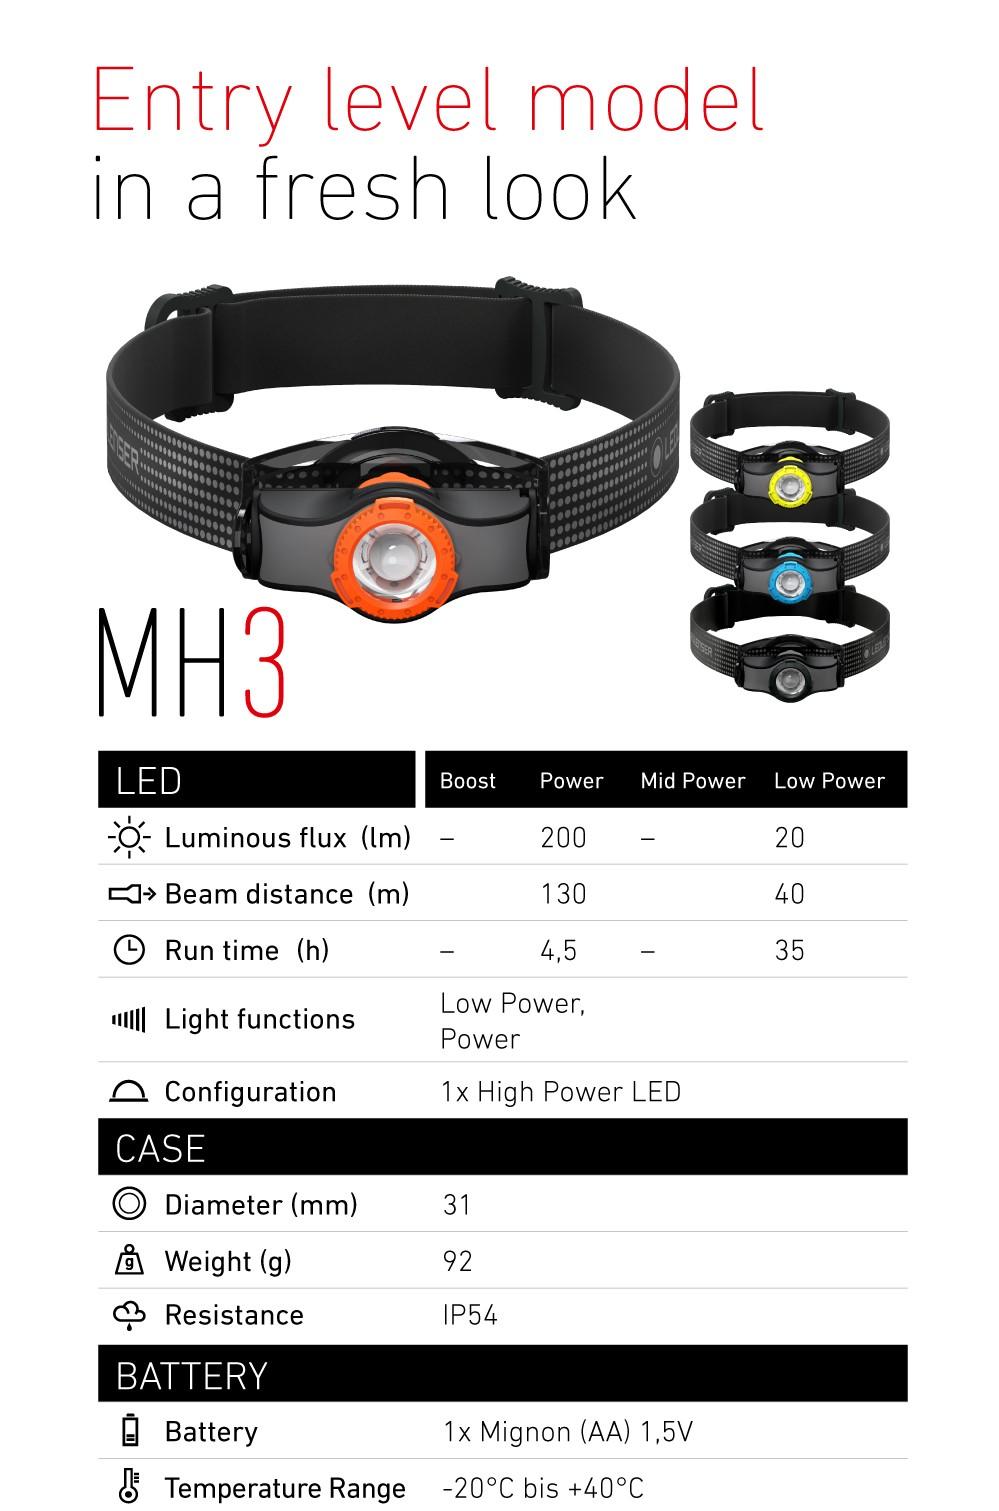 LED Lenser MH3 Headlamp, AA Battery, 200 Lumens at 92g, Advanced Focus System, Dual Power Source, Rapid Focus, headlight, night hiking, lamp, lampu kepala